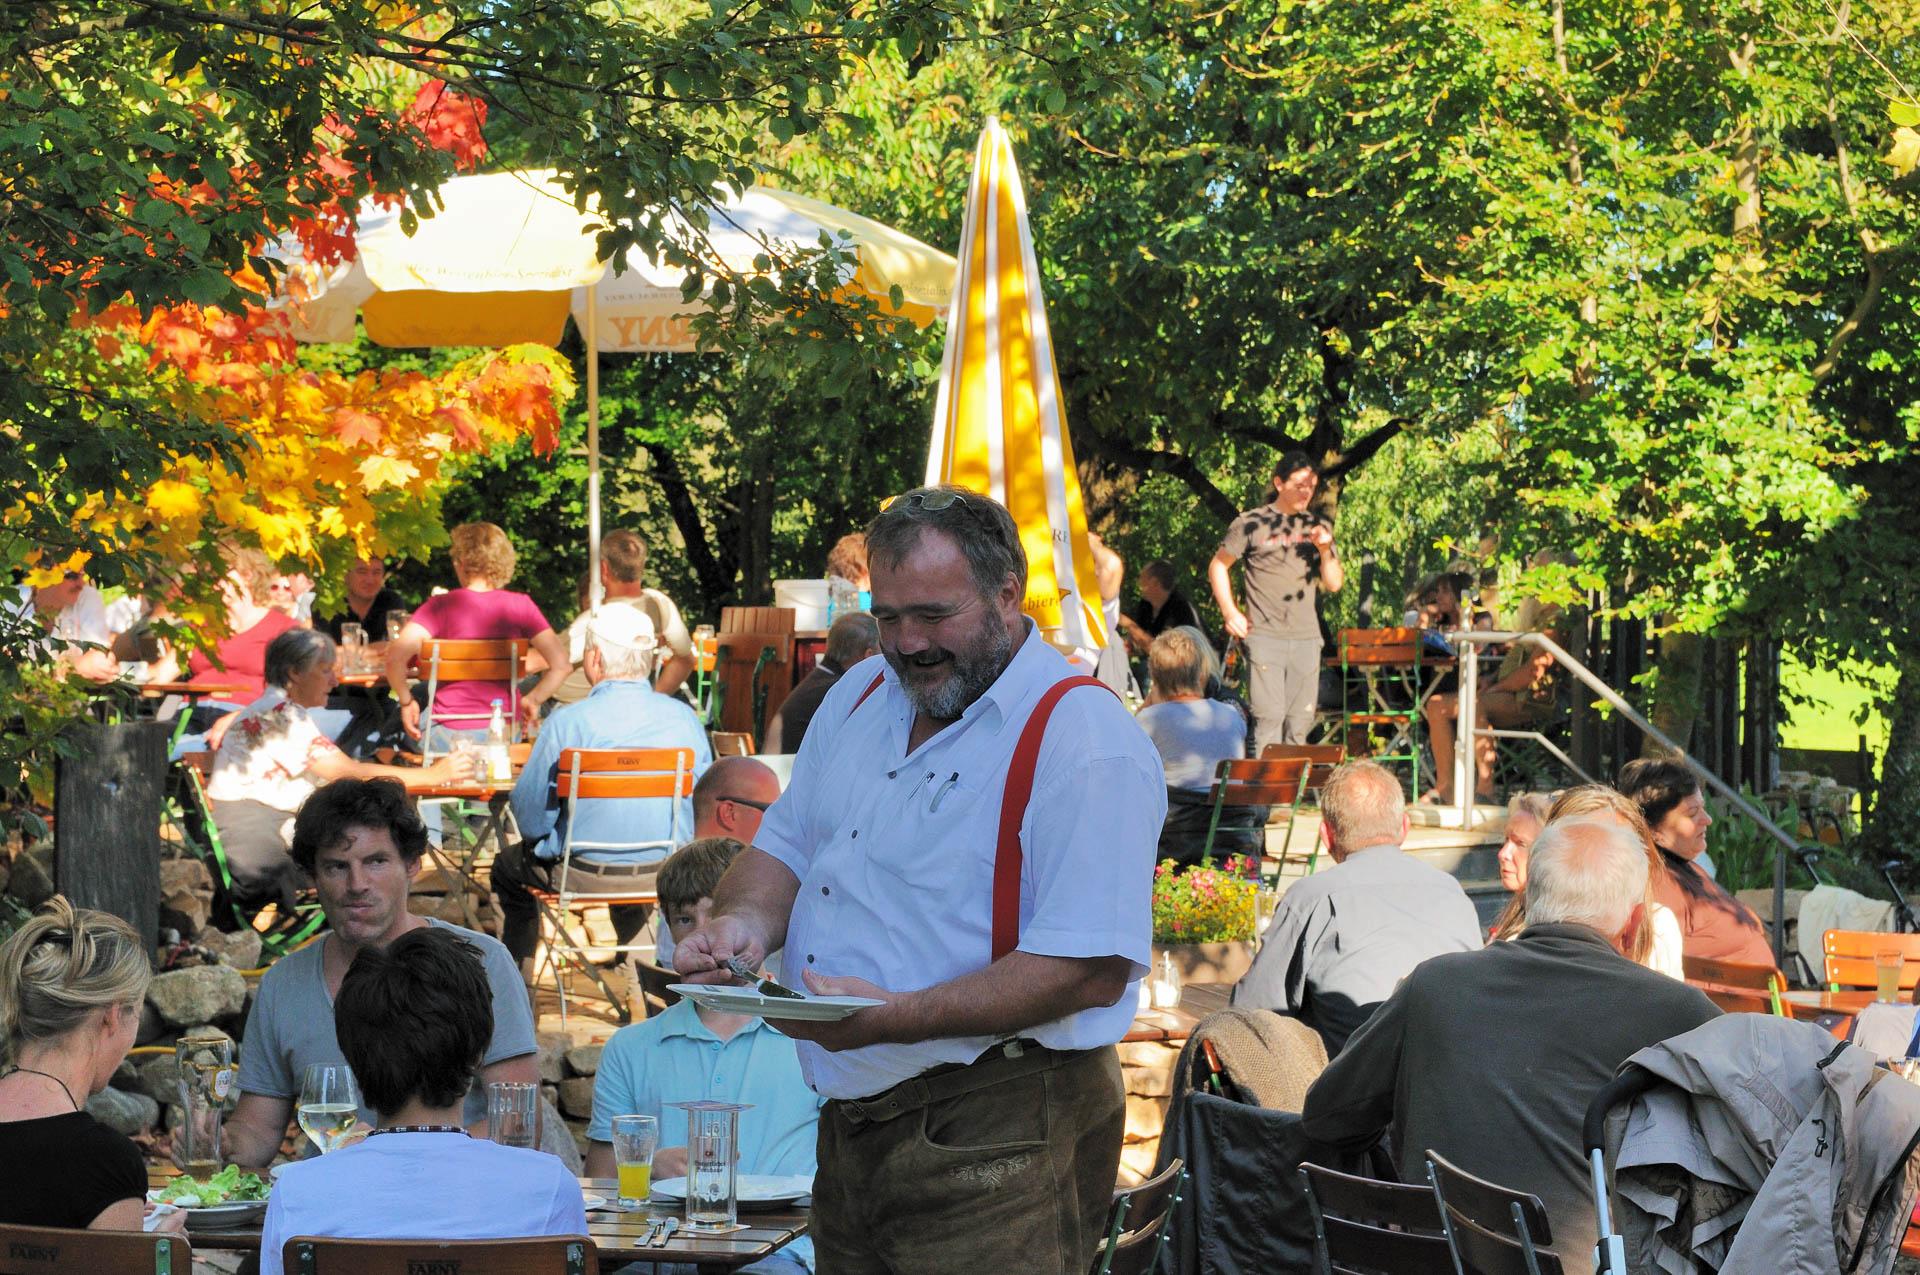 Adelbert das Original kümmert sich ums Wohl der Gäste im Biergarten bei Kressbronn am Bodensee